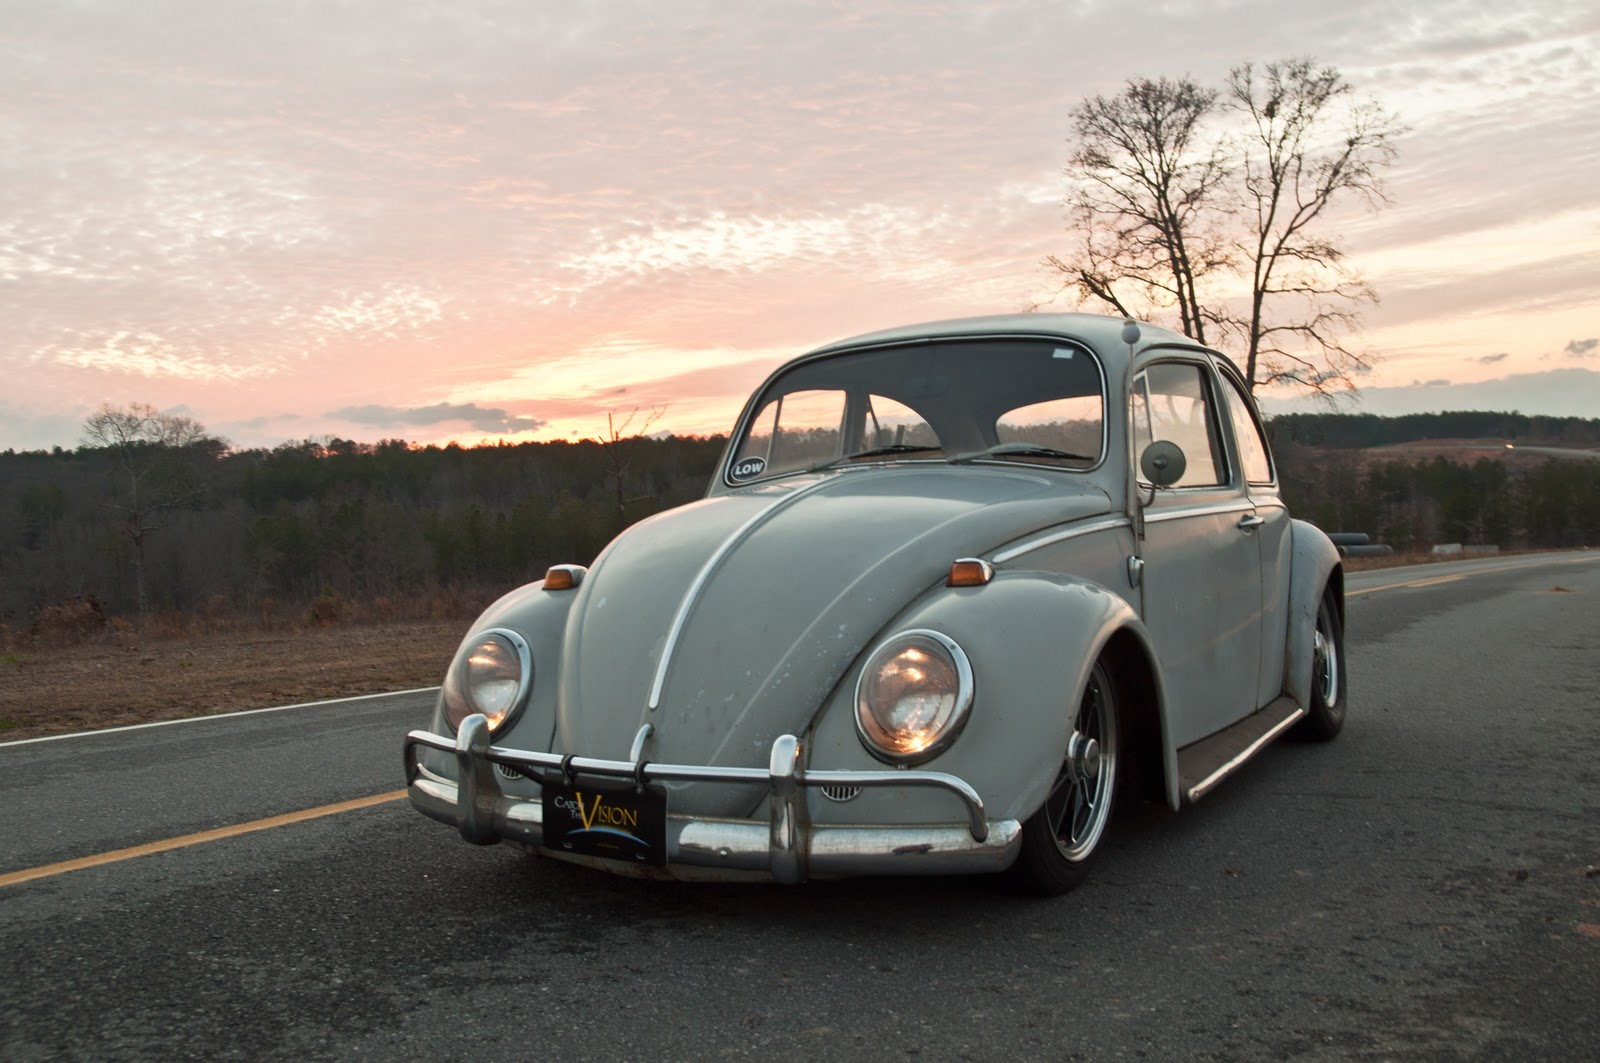 Otis - my '65 Beetle DSC_0060